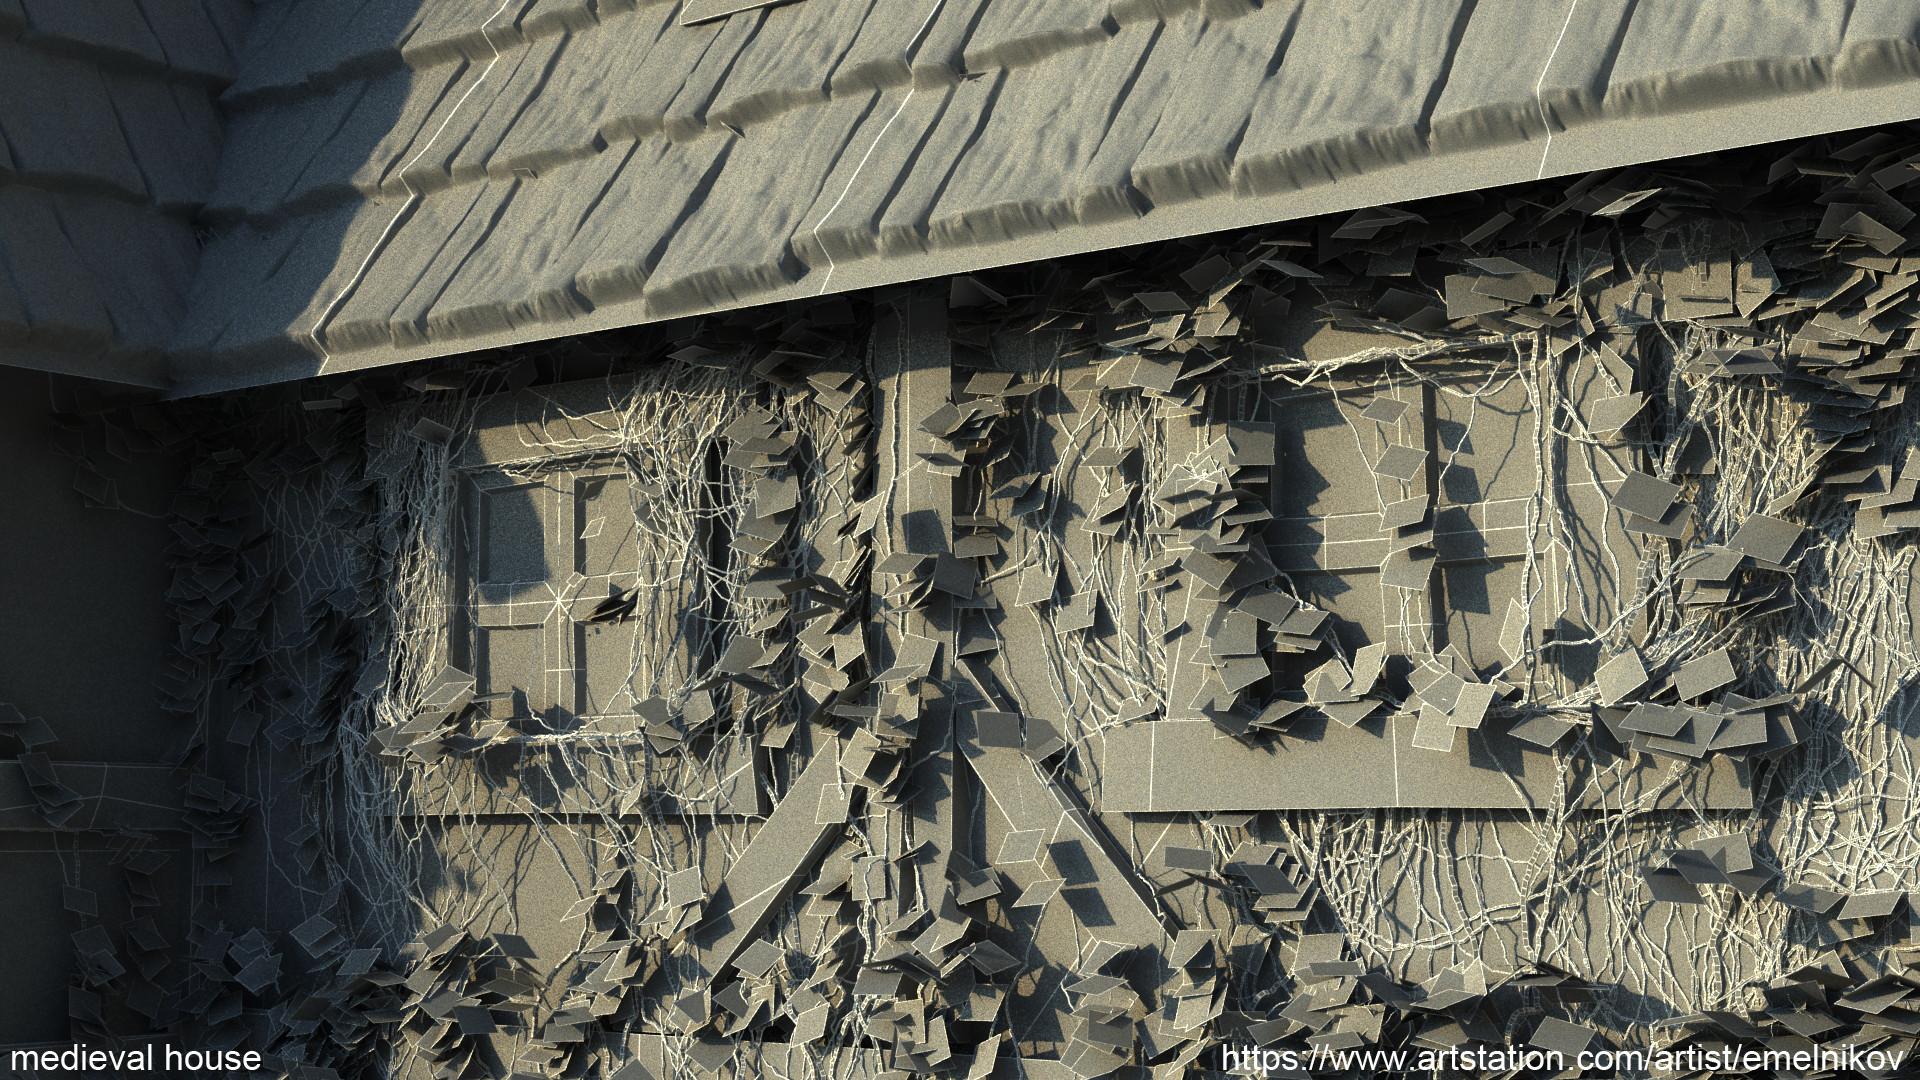 Eugene melnikov medieval house1 render frm15 wire